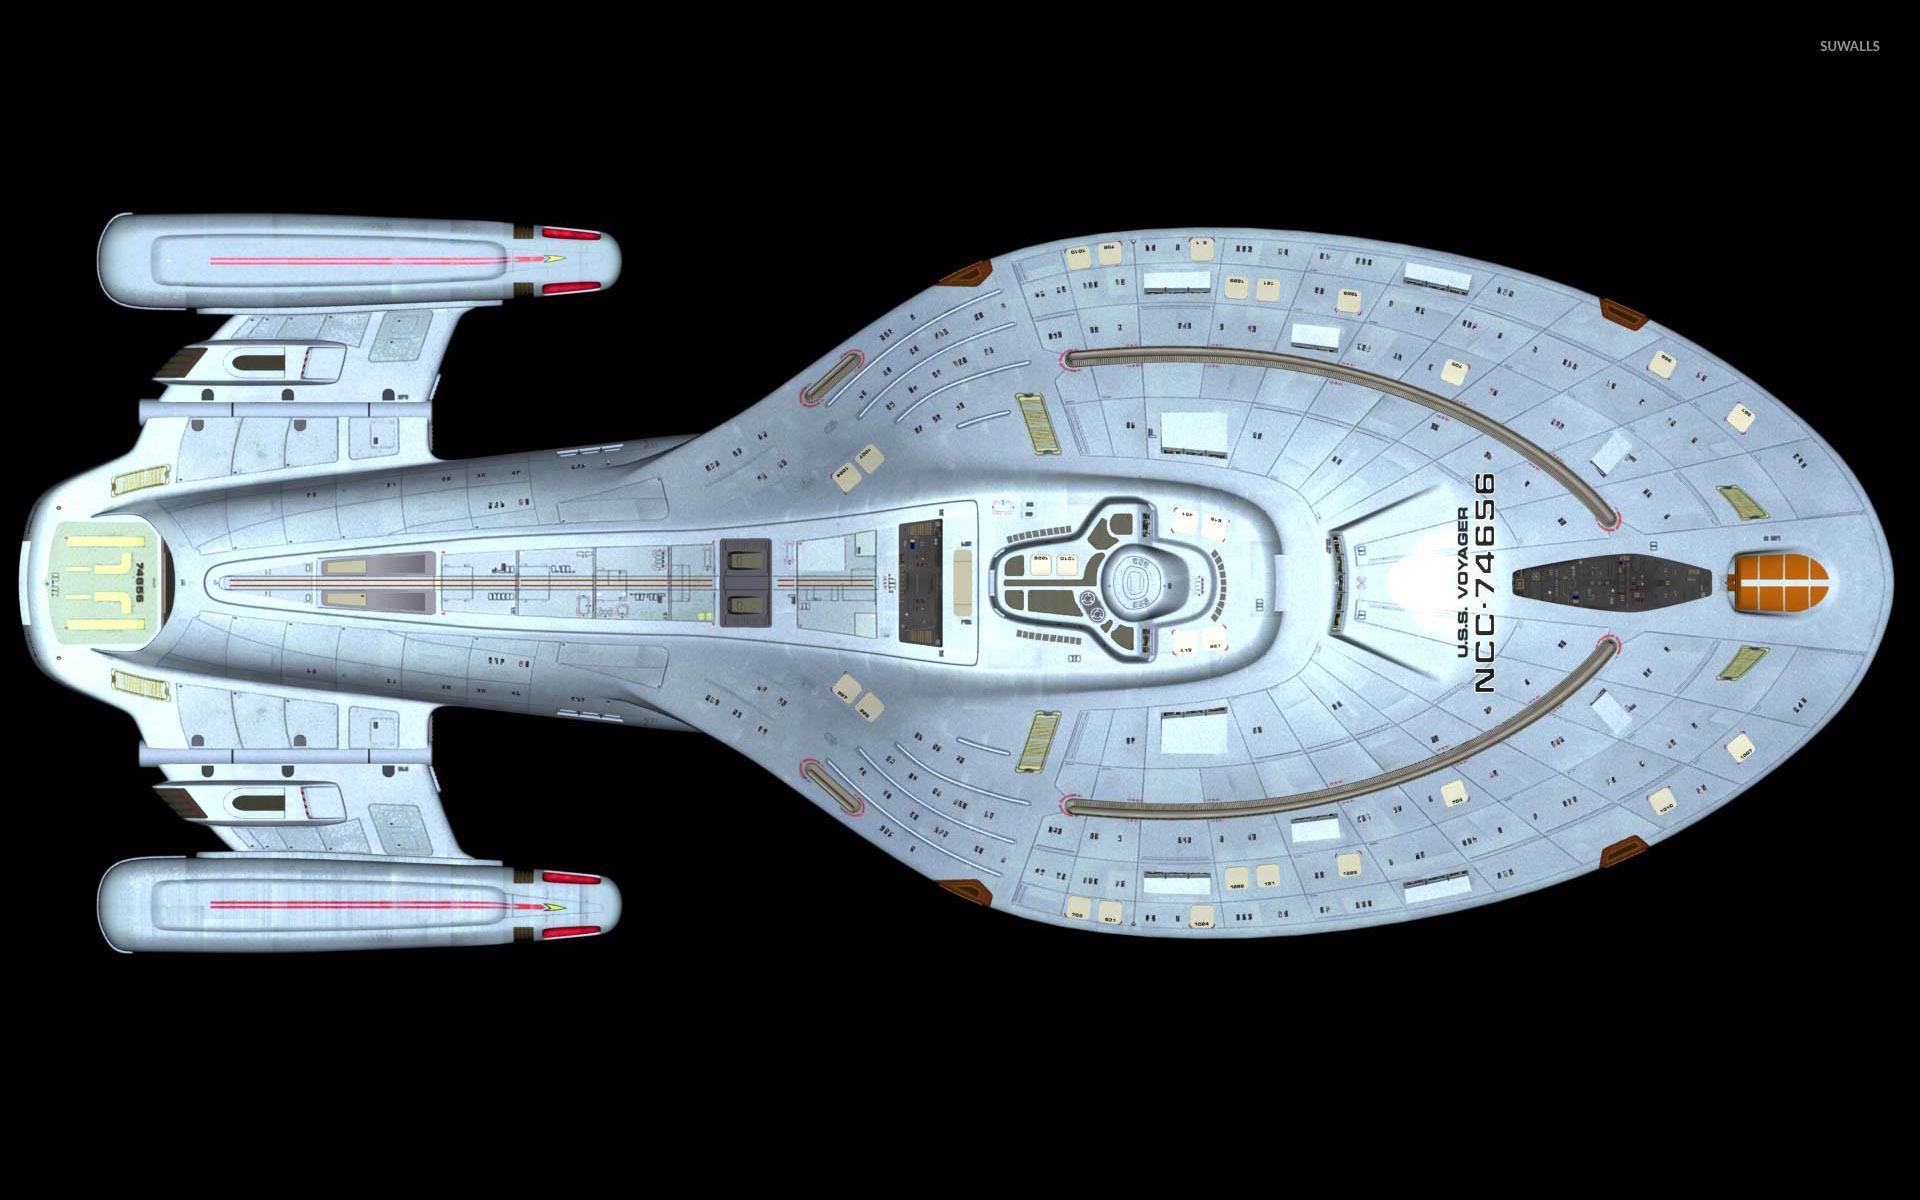 Uss Voyager Star Trek 3 Wallpaper Movie Wallpapers